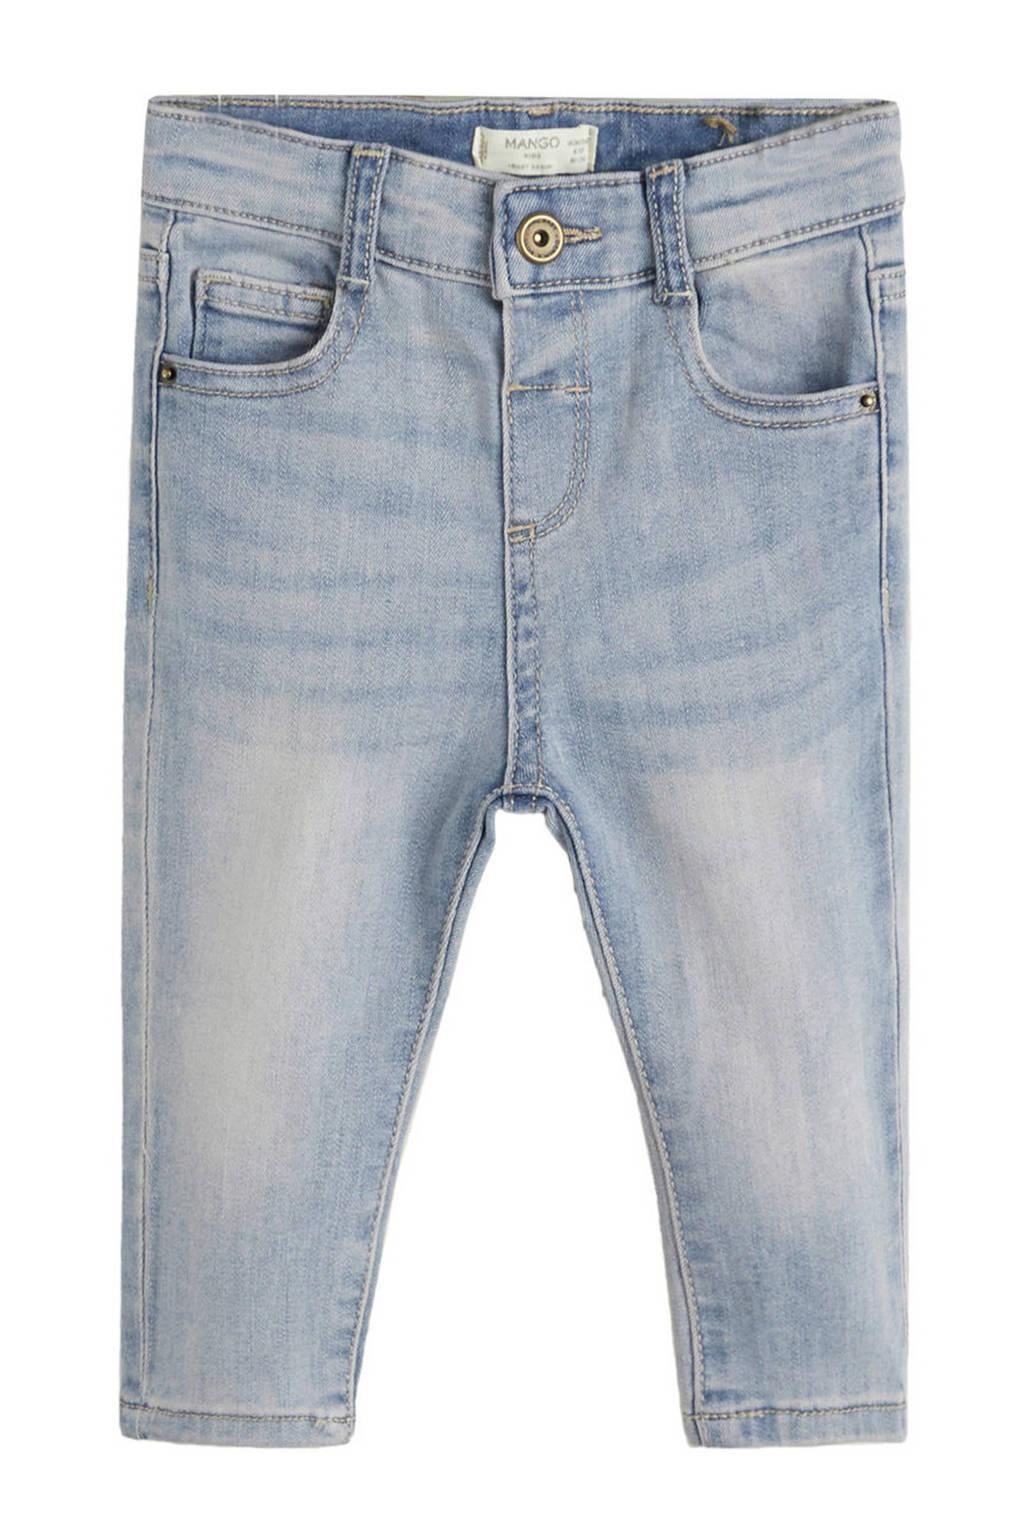 Mango Kids high waist skinny jeans, changeant blauw